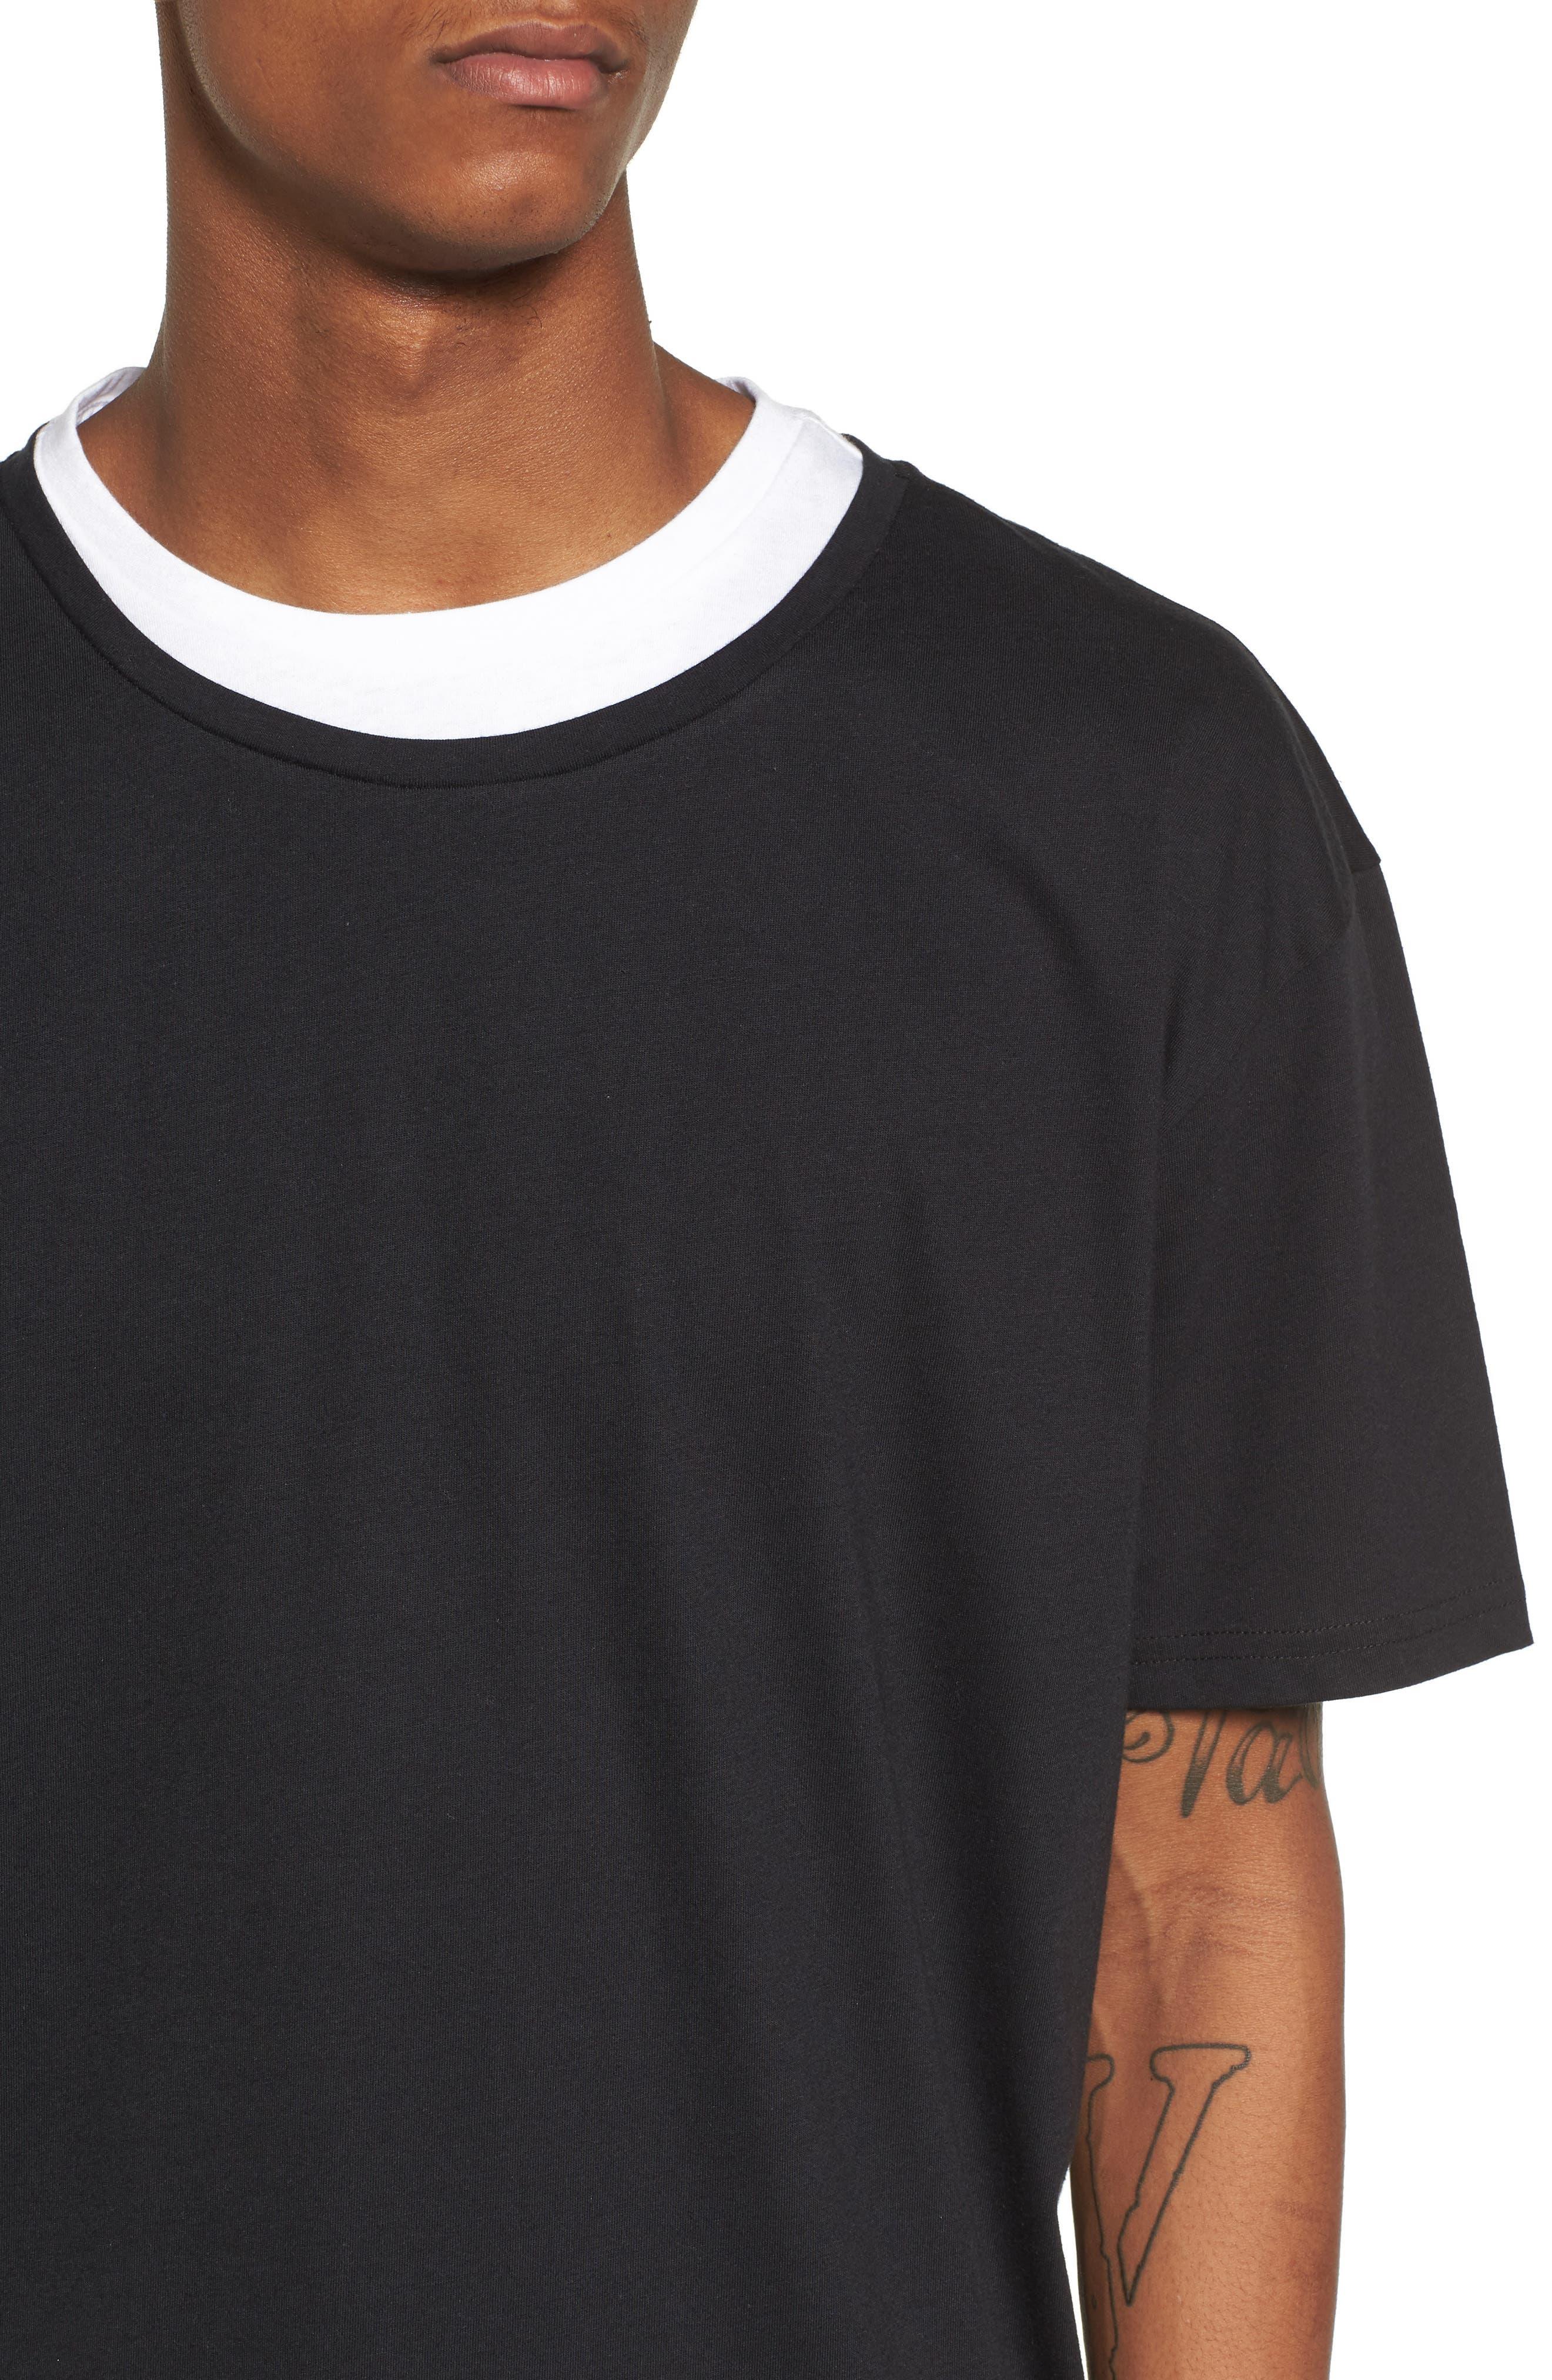 Double Layer T-Shirt,                             Alternate thumbnail 4, color,                             Black/ White